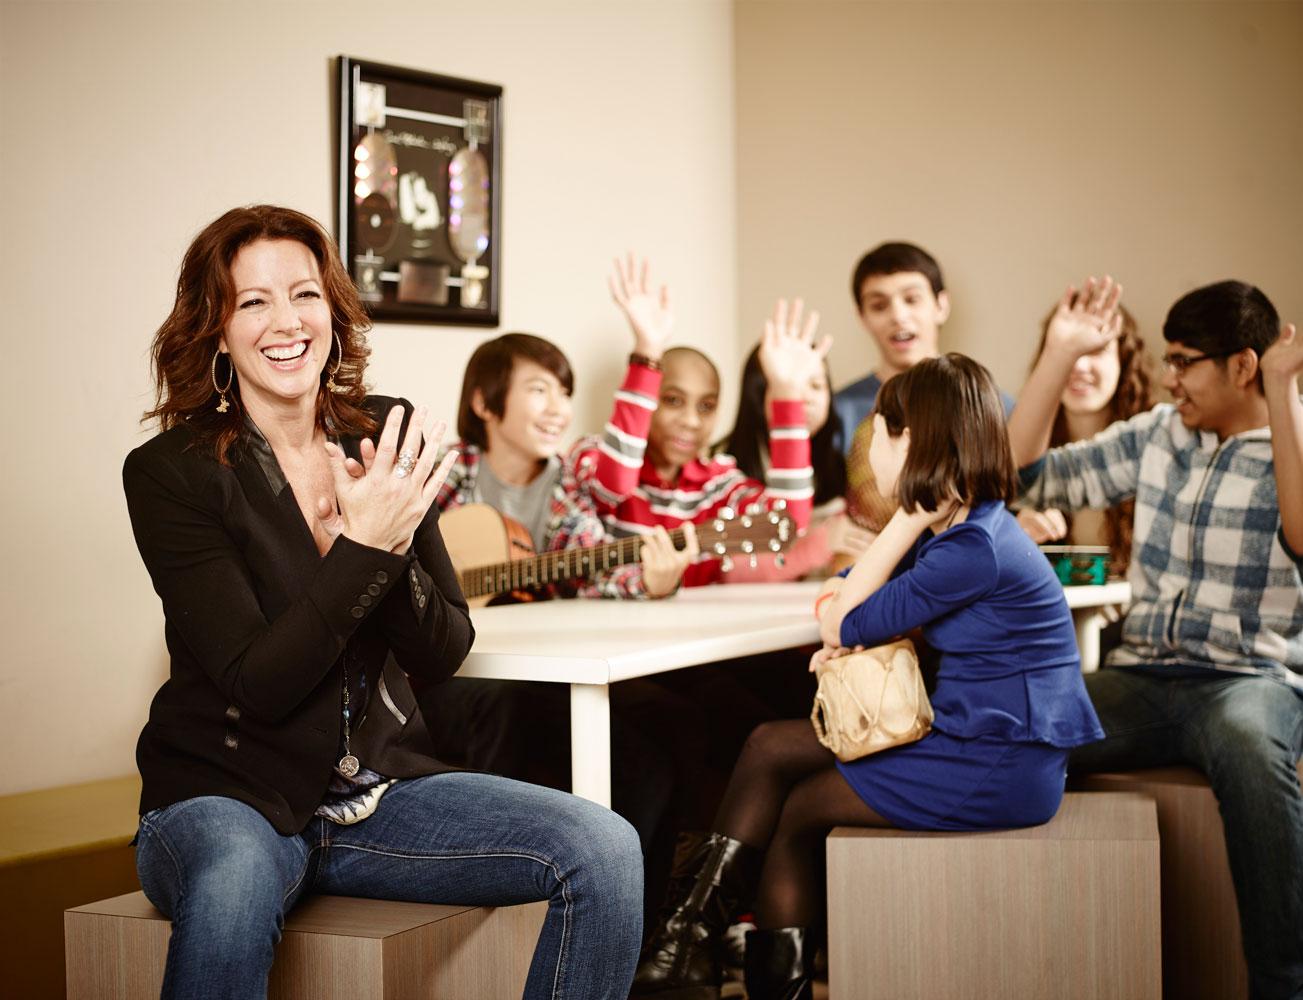 Sarah Mclachlan school